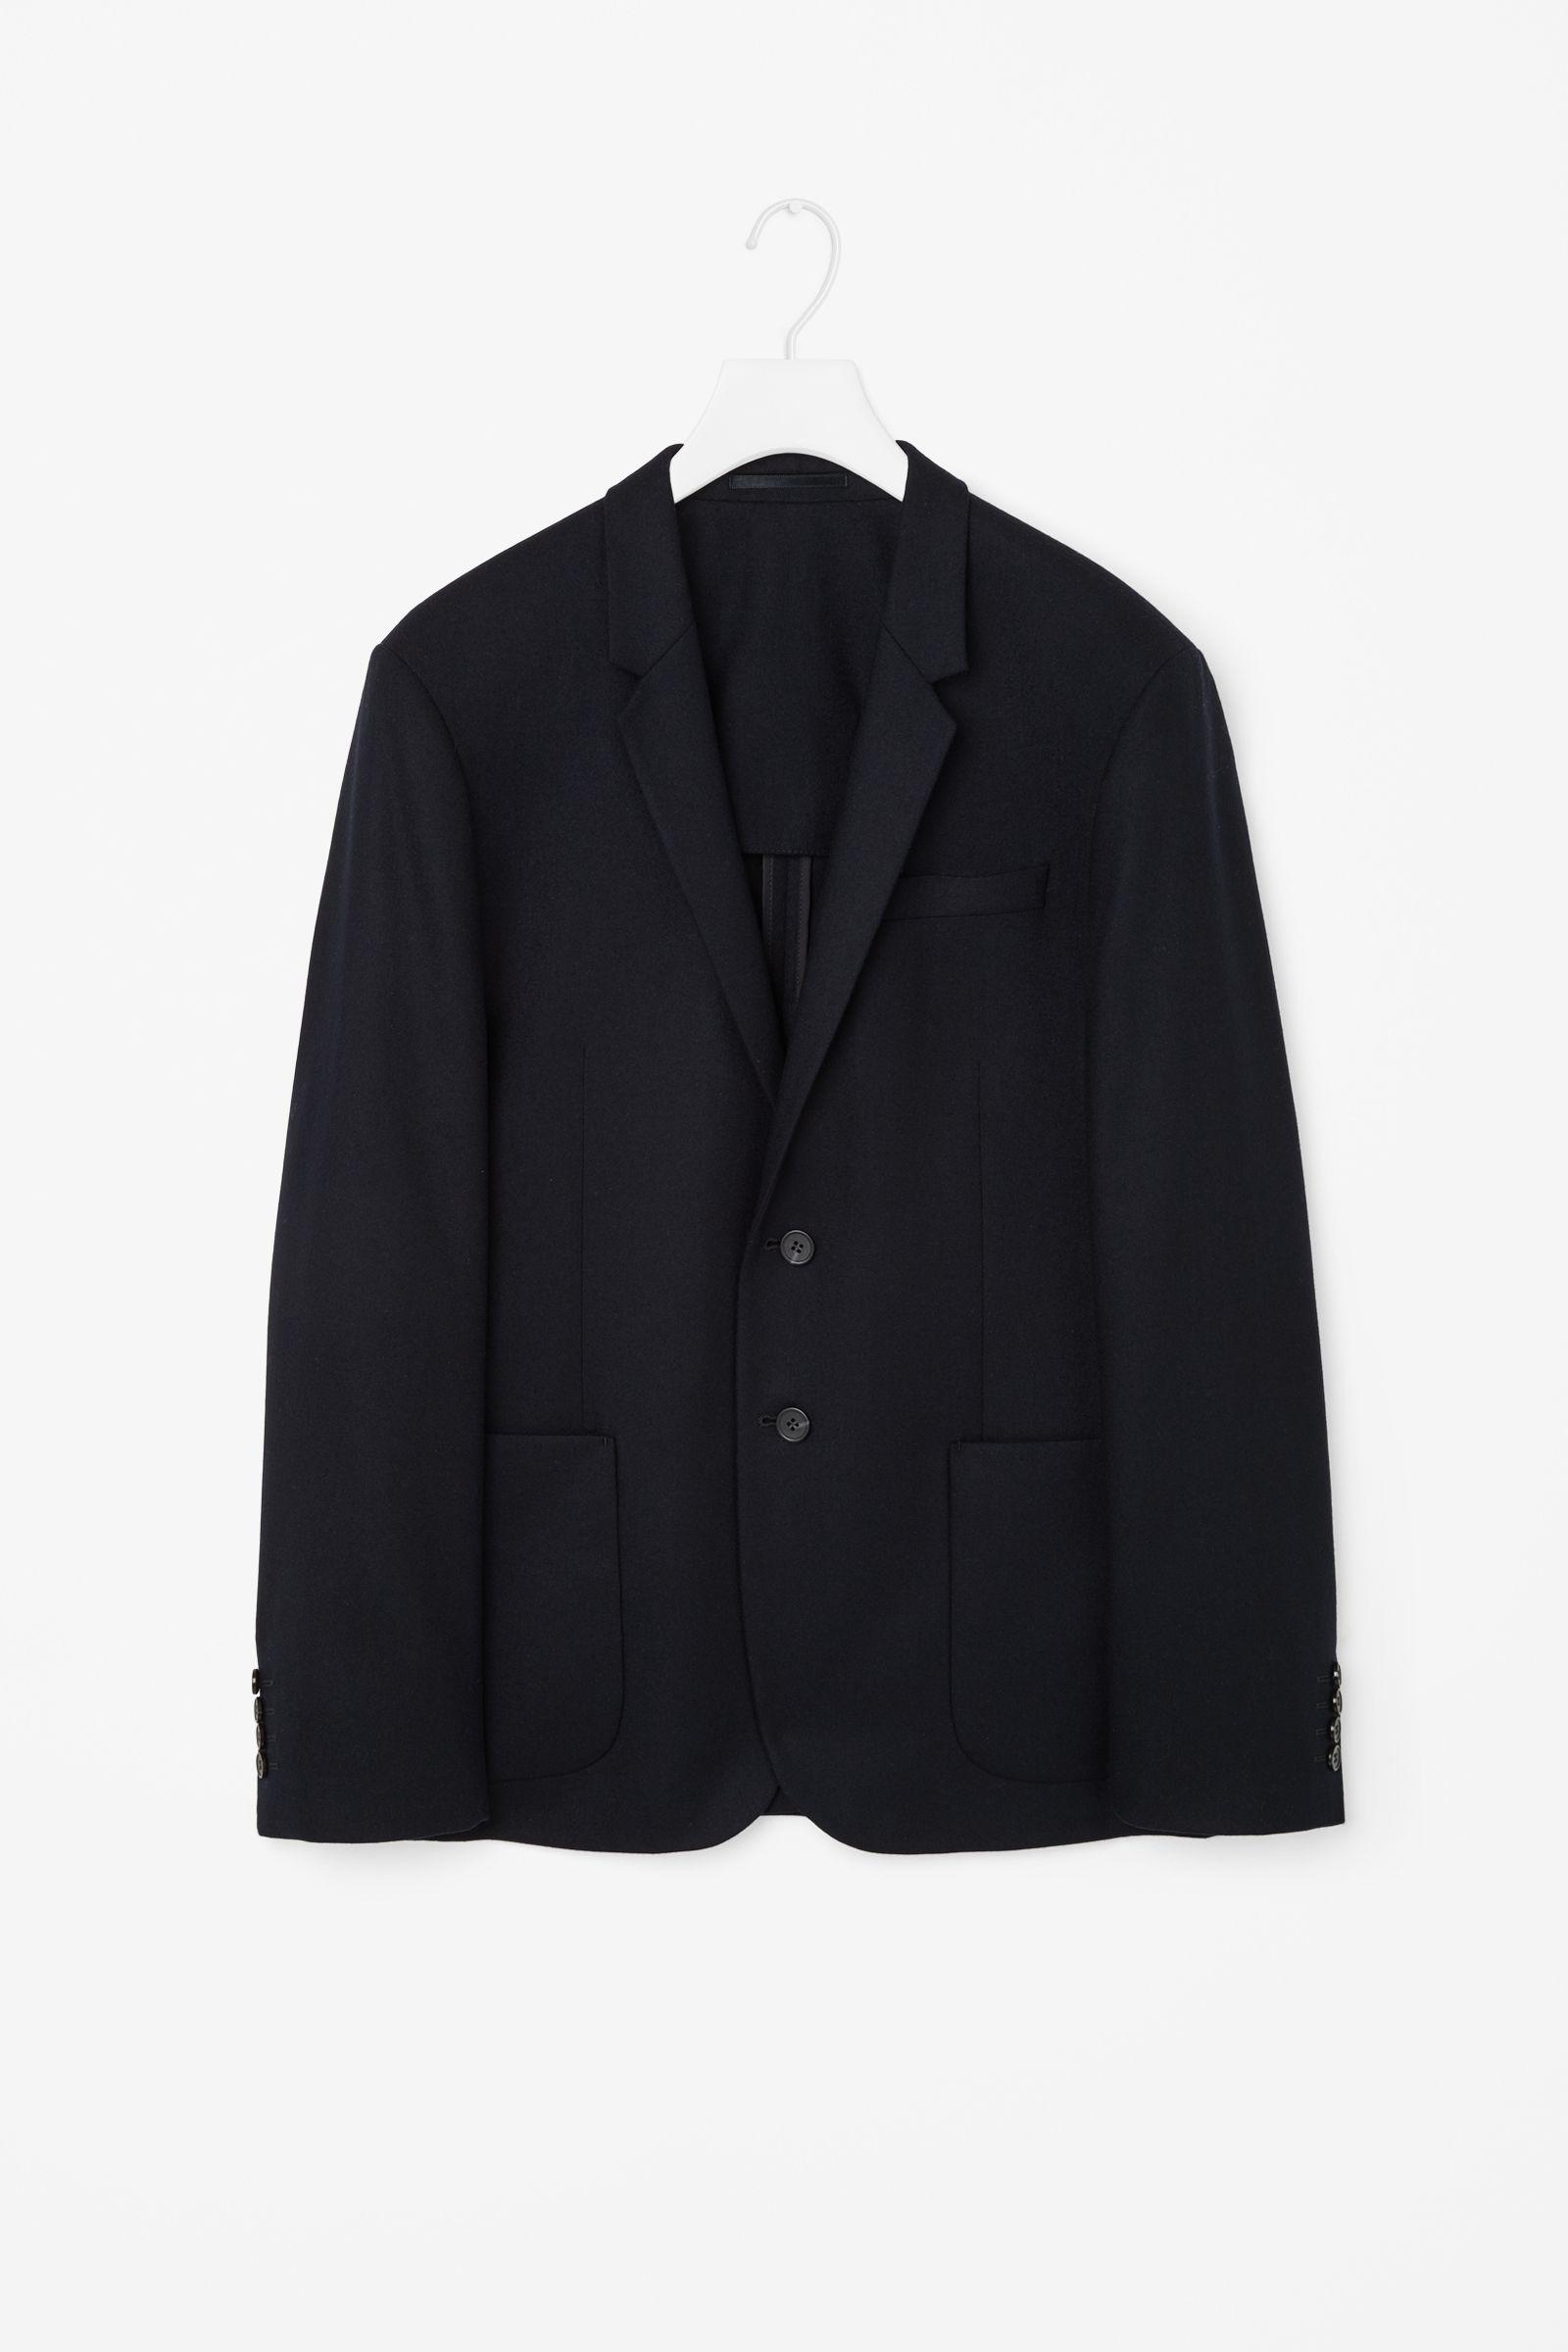 Wool cashmere flannel jacket  Wool flannel blazer  ropa y Accesorios  Pinterest  Flannels